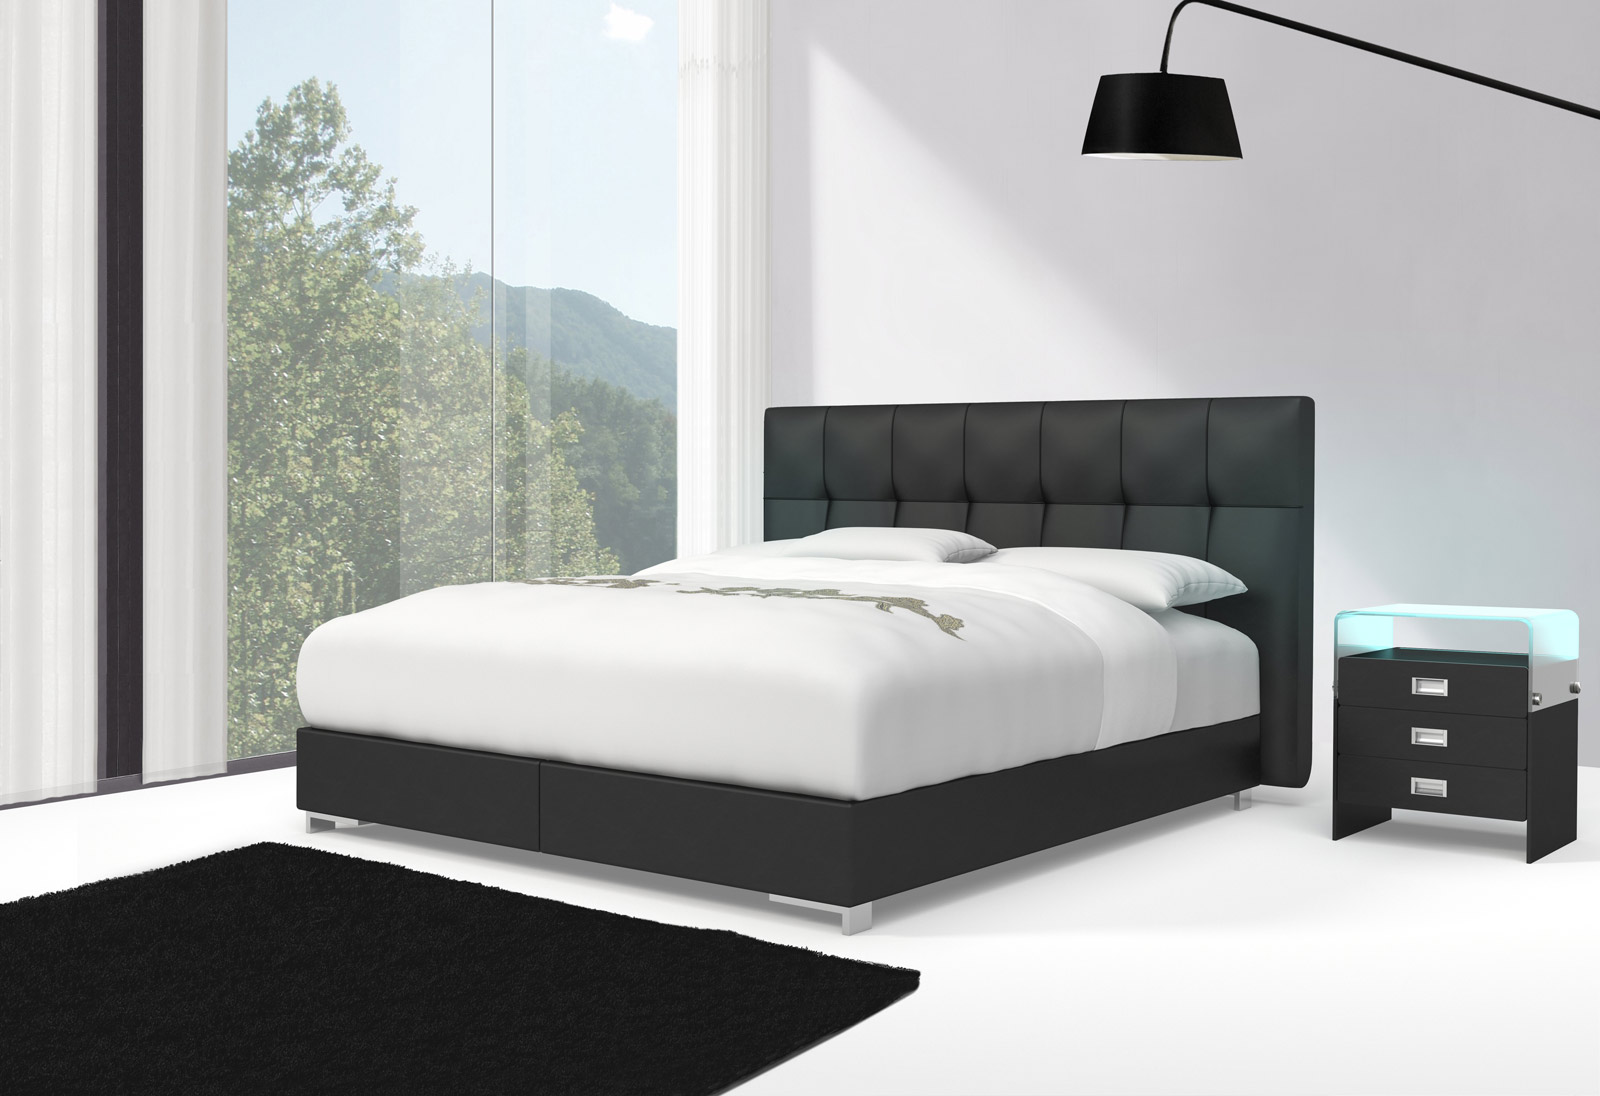 sam design boxspringbett 140 x 200 cm schwarz zarah toledo 27cm. Black Bedroom Furniture Sets. Home Design Ideas